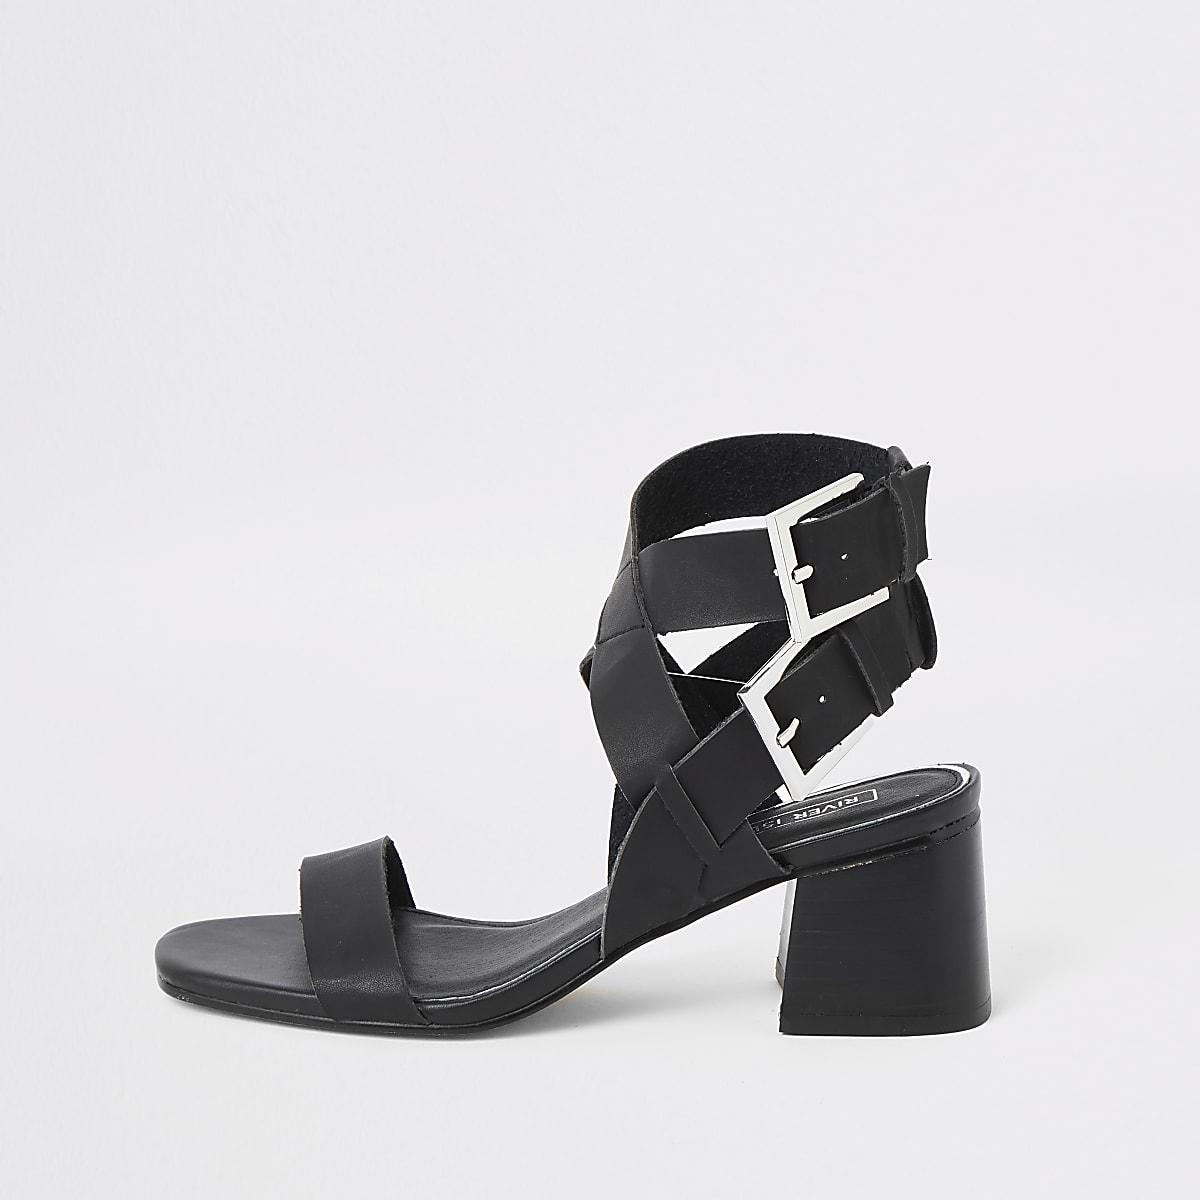 aa6e3a4c461 Black double buckle block heel sandals